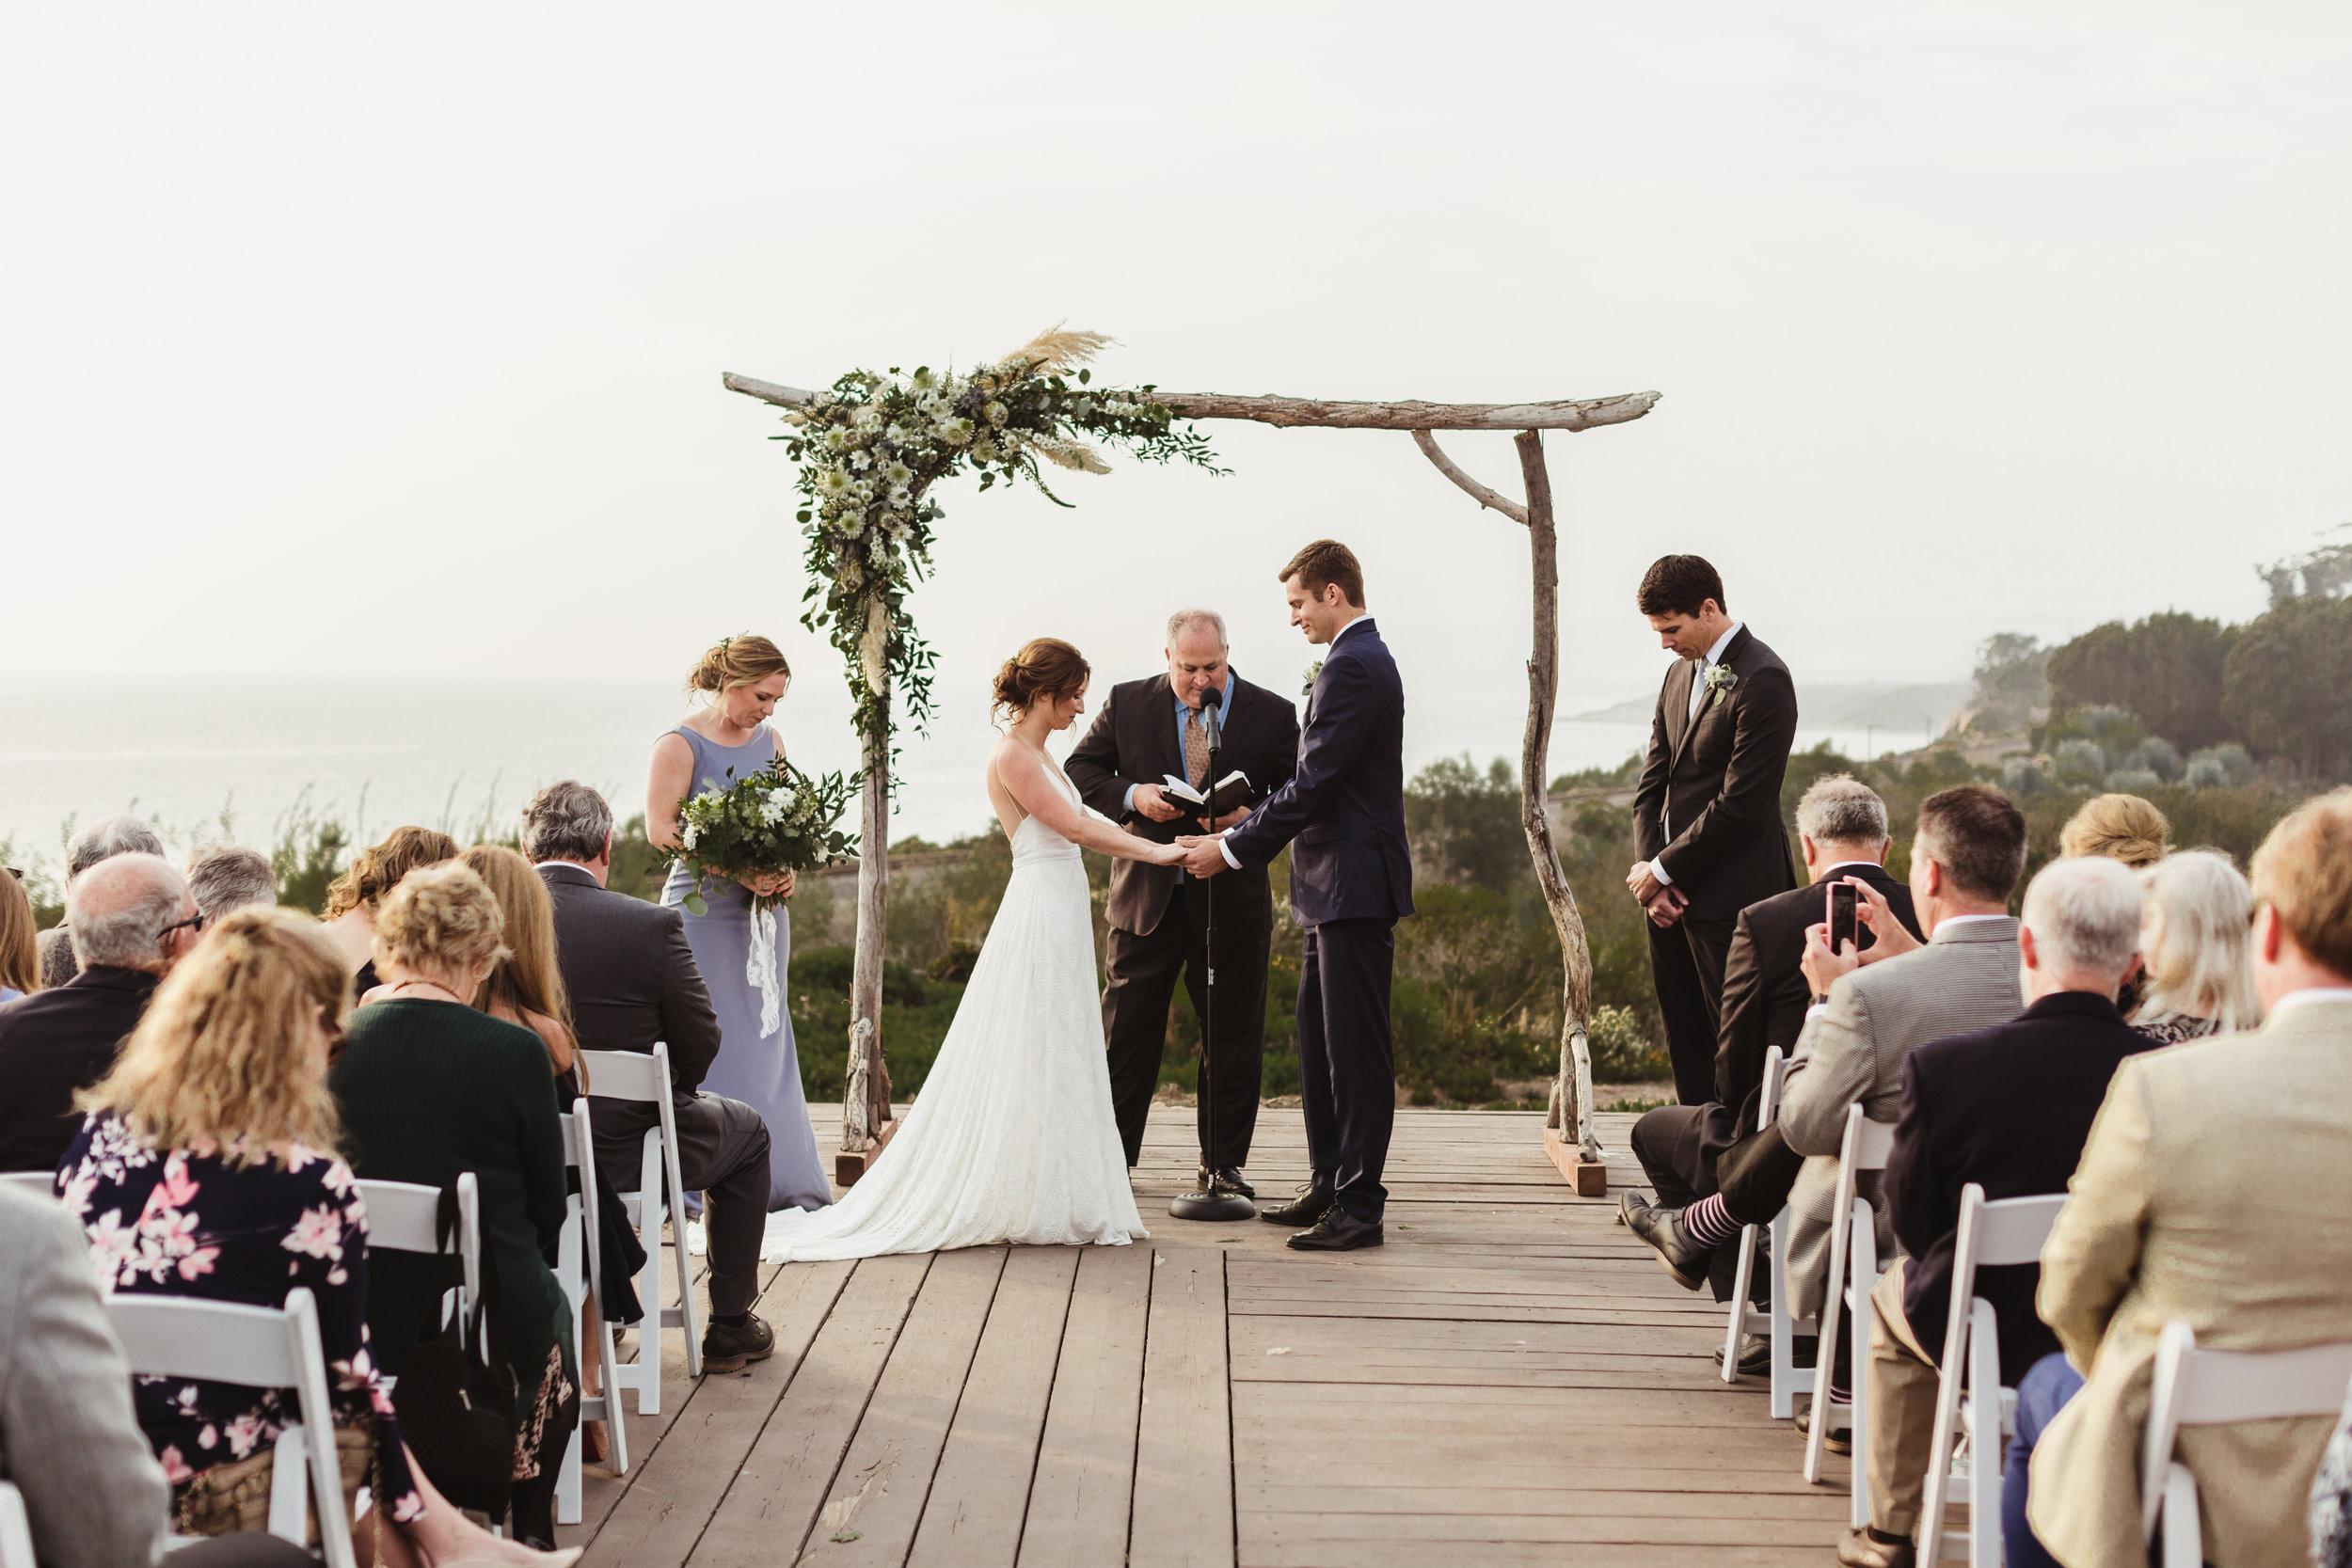 Jamie_English_Photography_JordanErik_Dos_Pueblos_Orchid_Wedding_Santa_Barbara_Fall2018-442.jpg